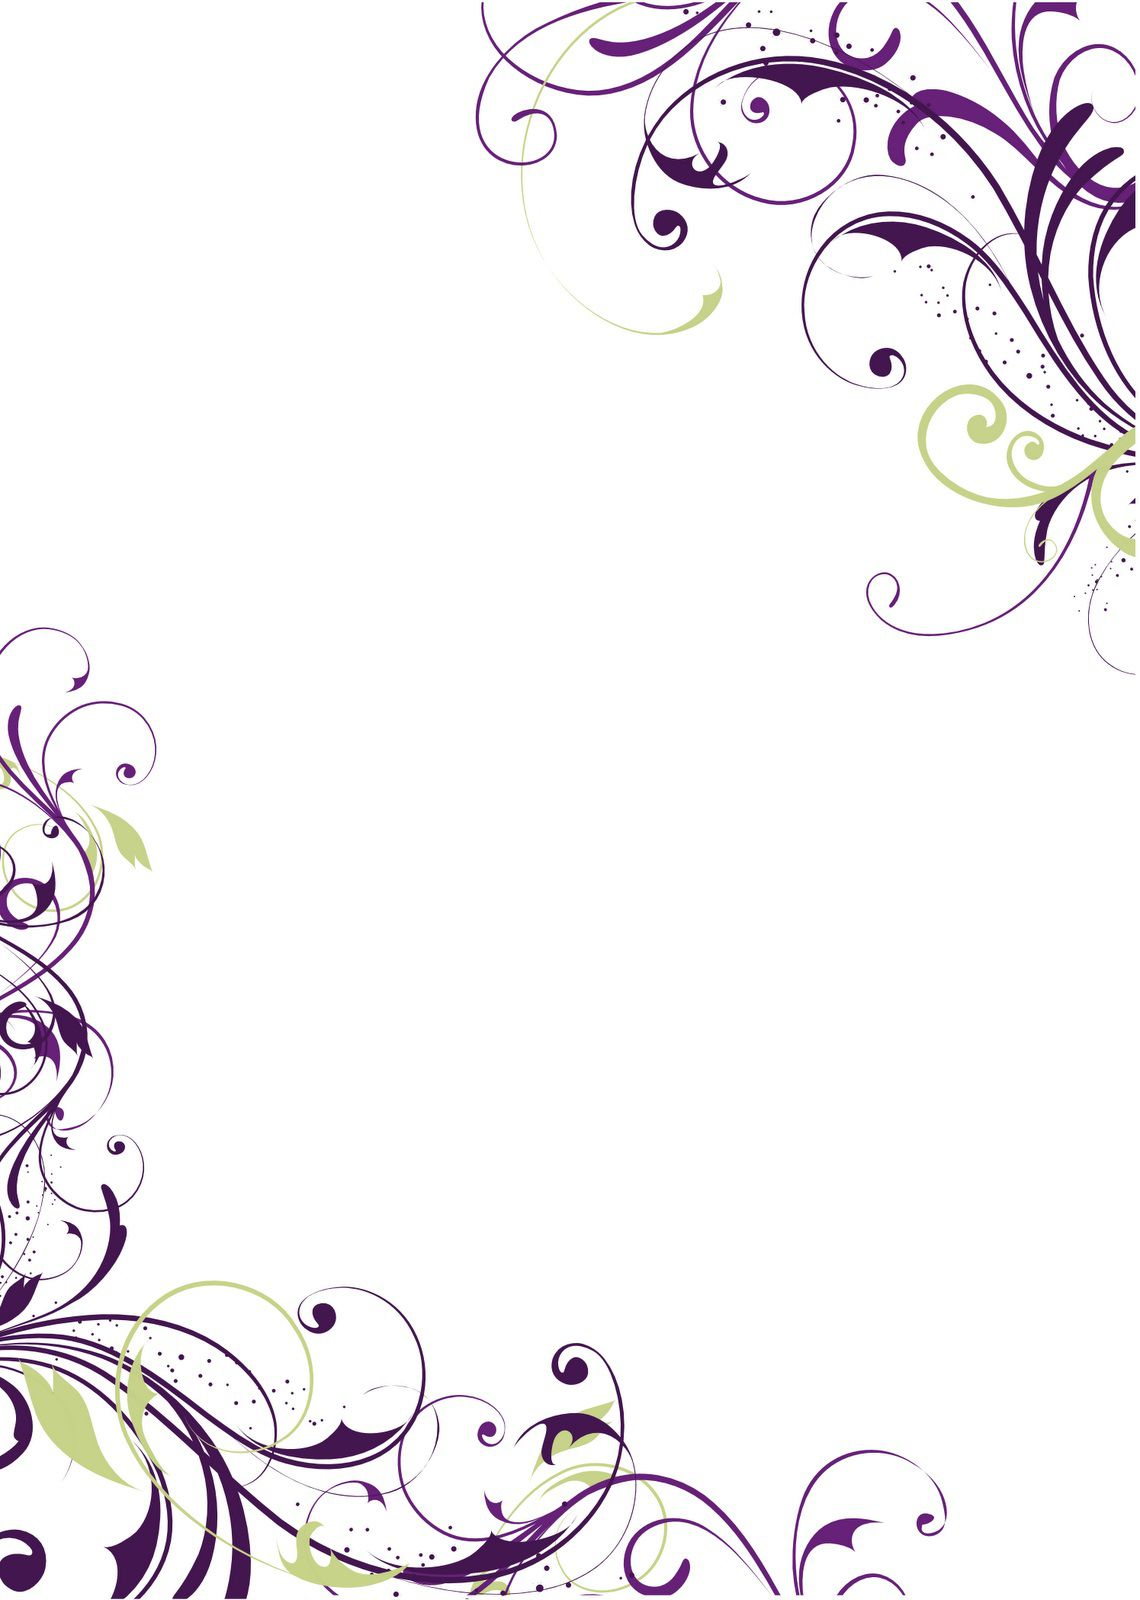 004 Surprising Blank Wedding Invitation Template High Resolution  Templates Free Download Printable Royal BlueFull